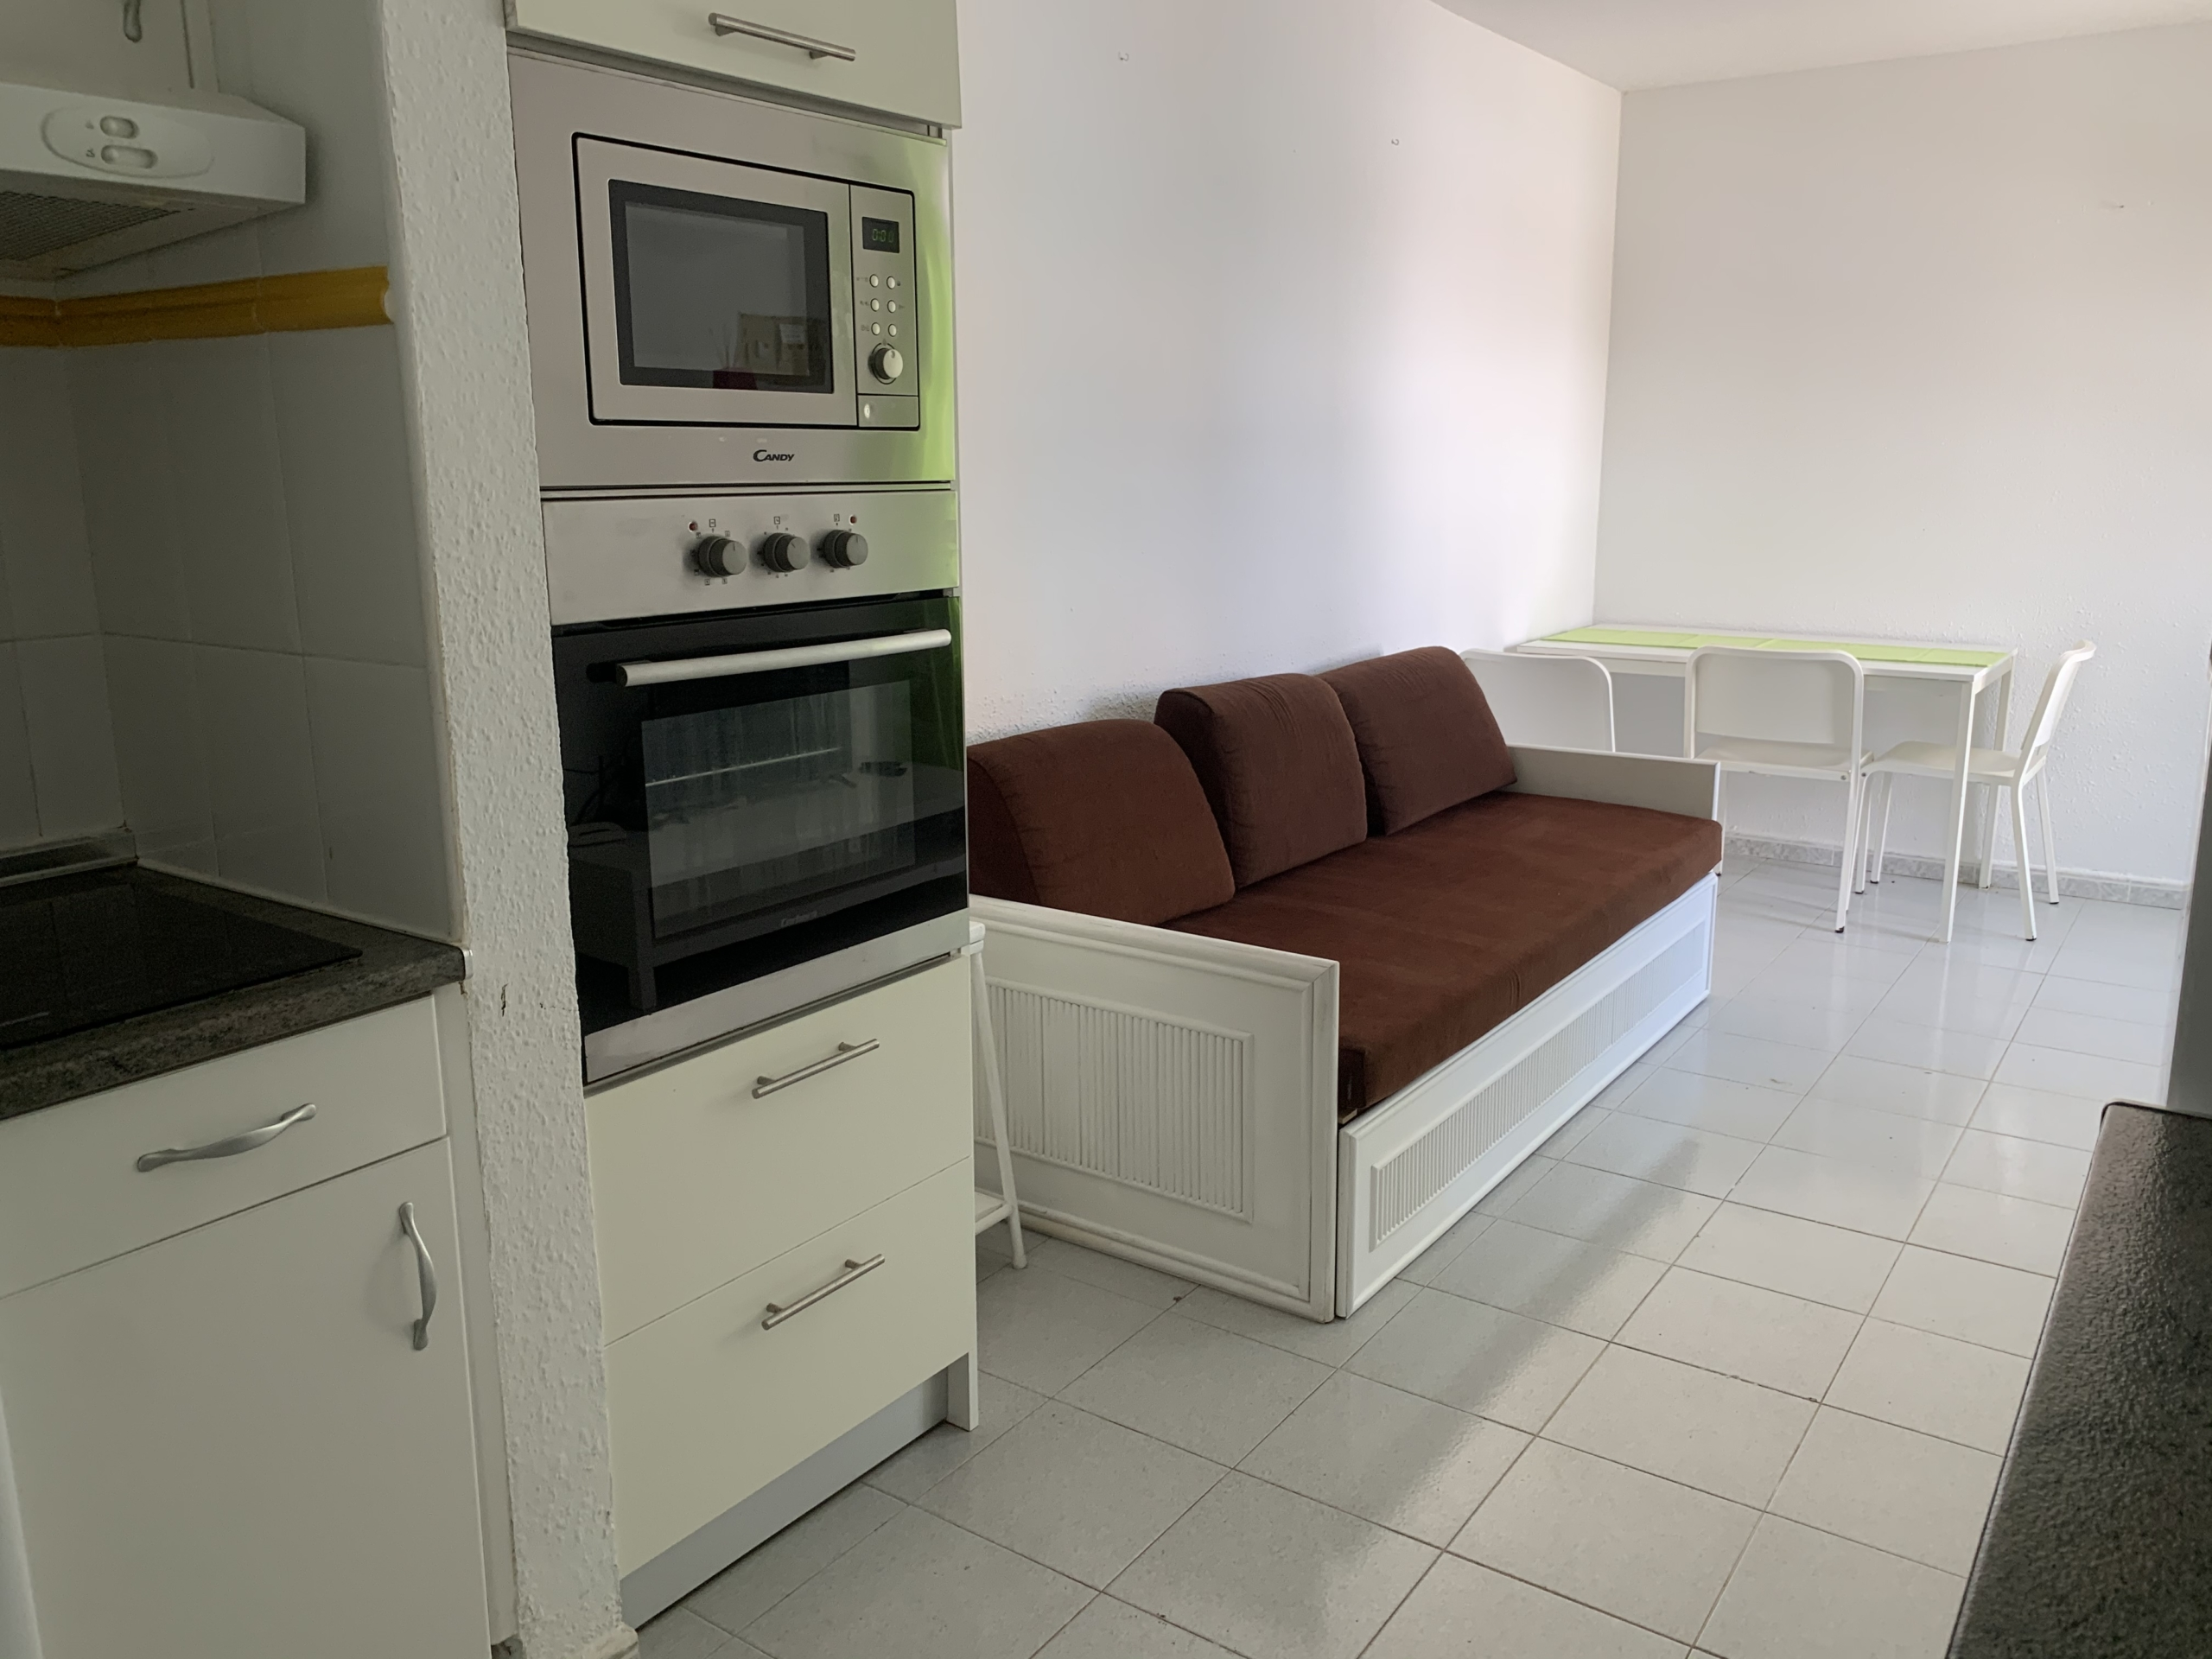 sofa and living area